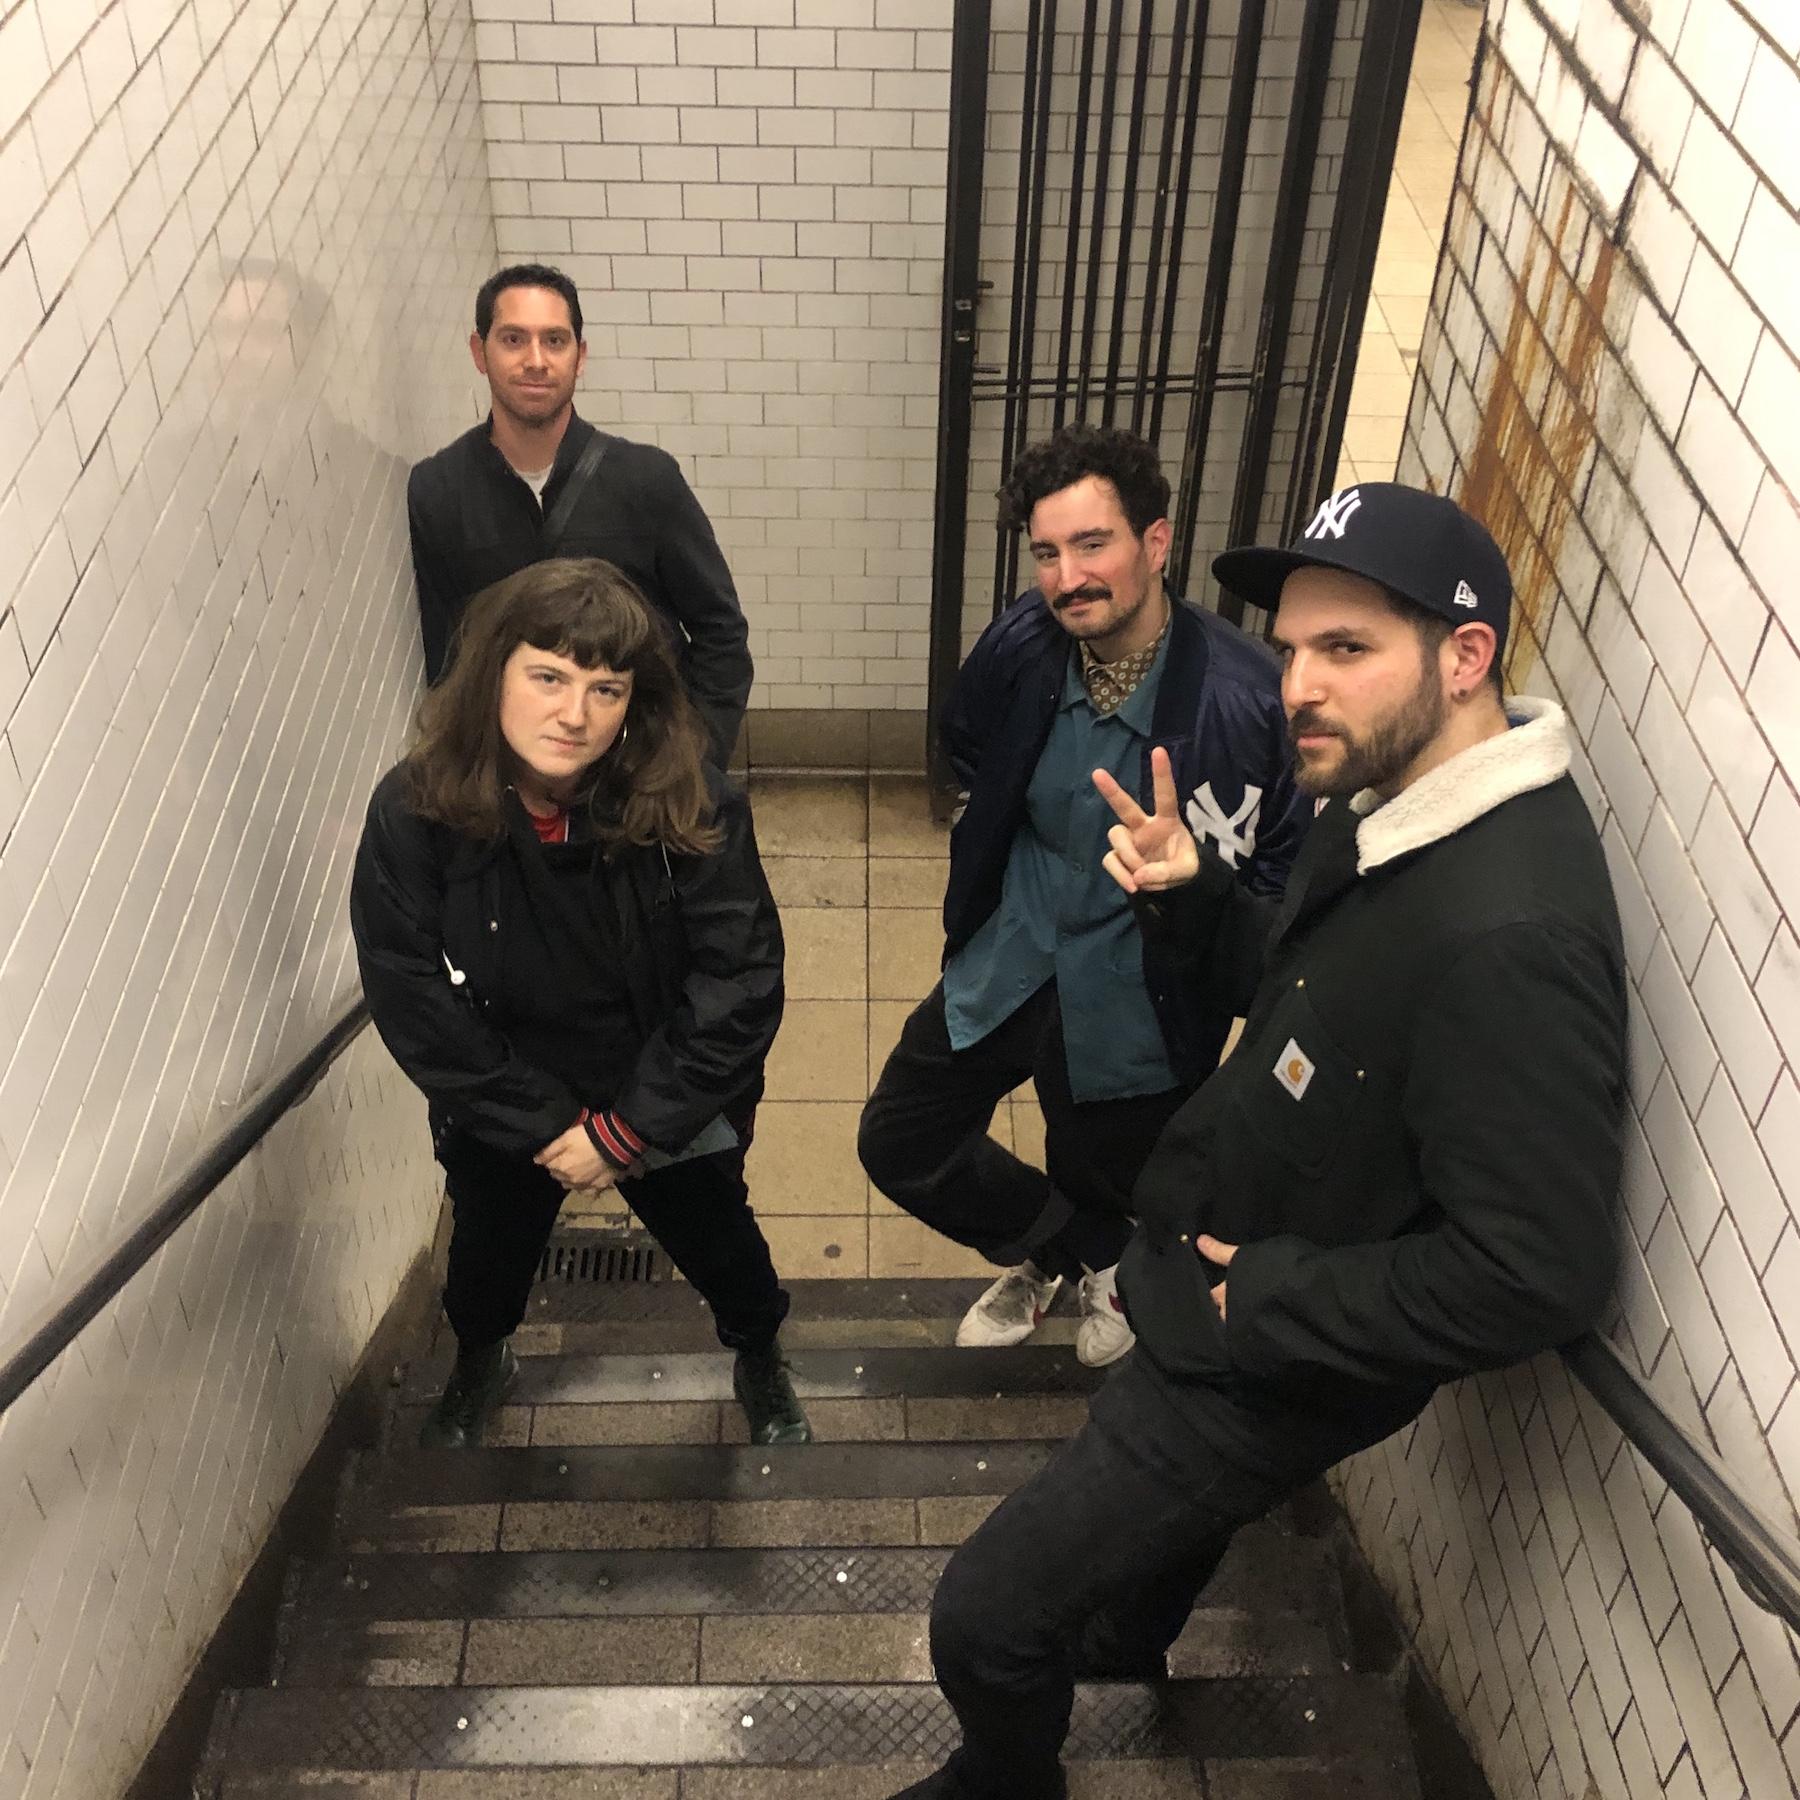 New York's Got Talent: Episode 13 - The Subway Episode